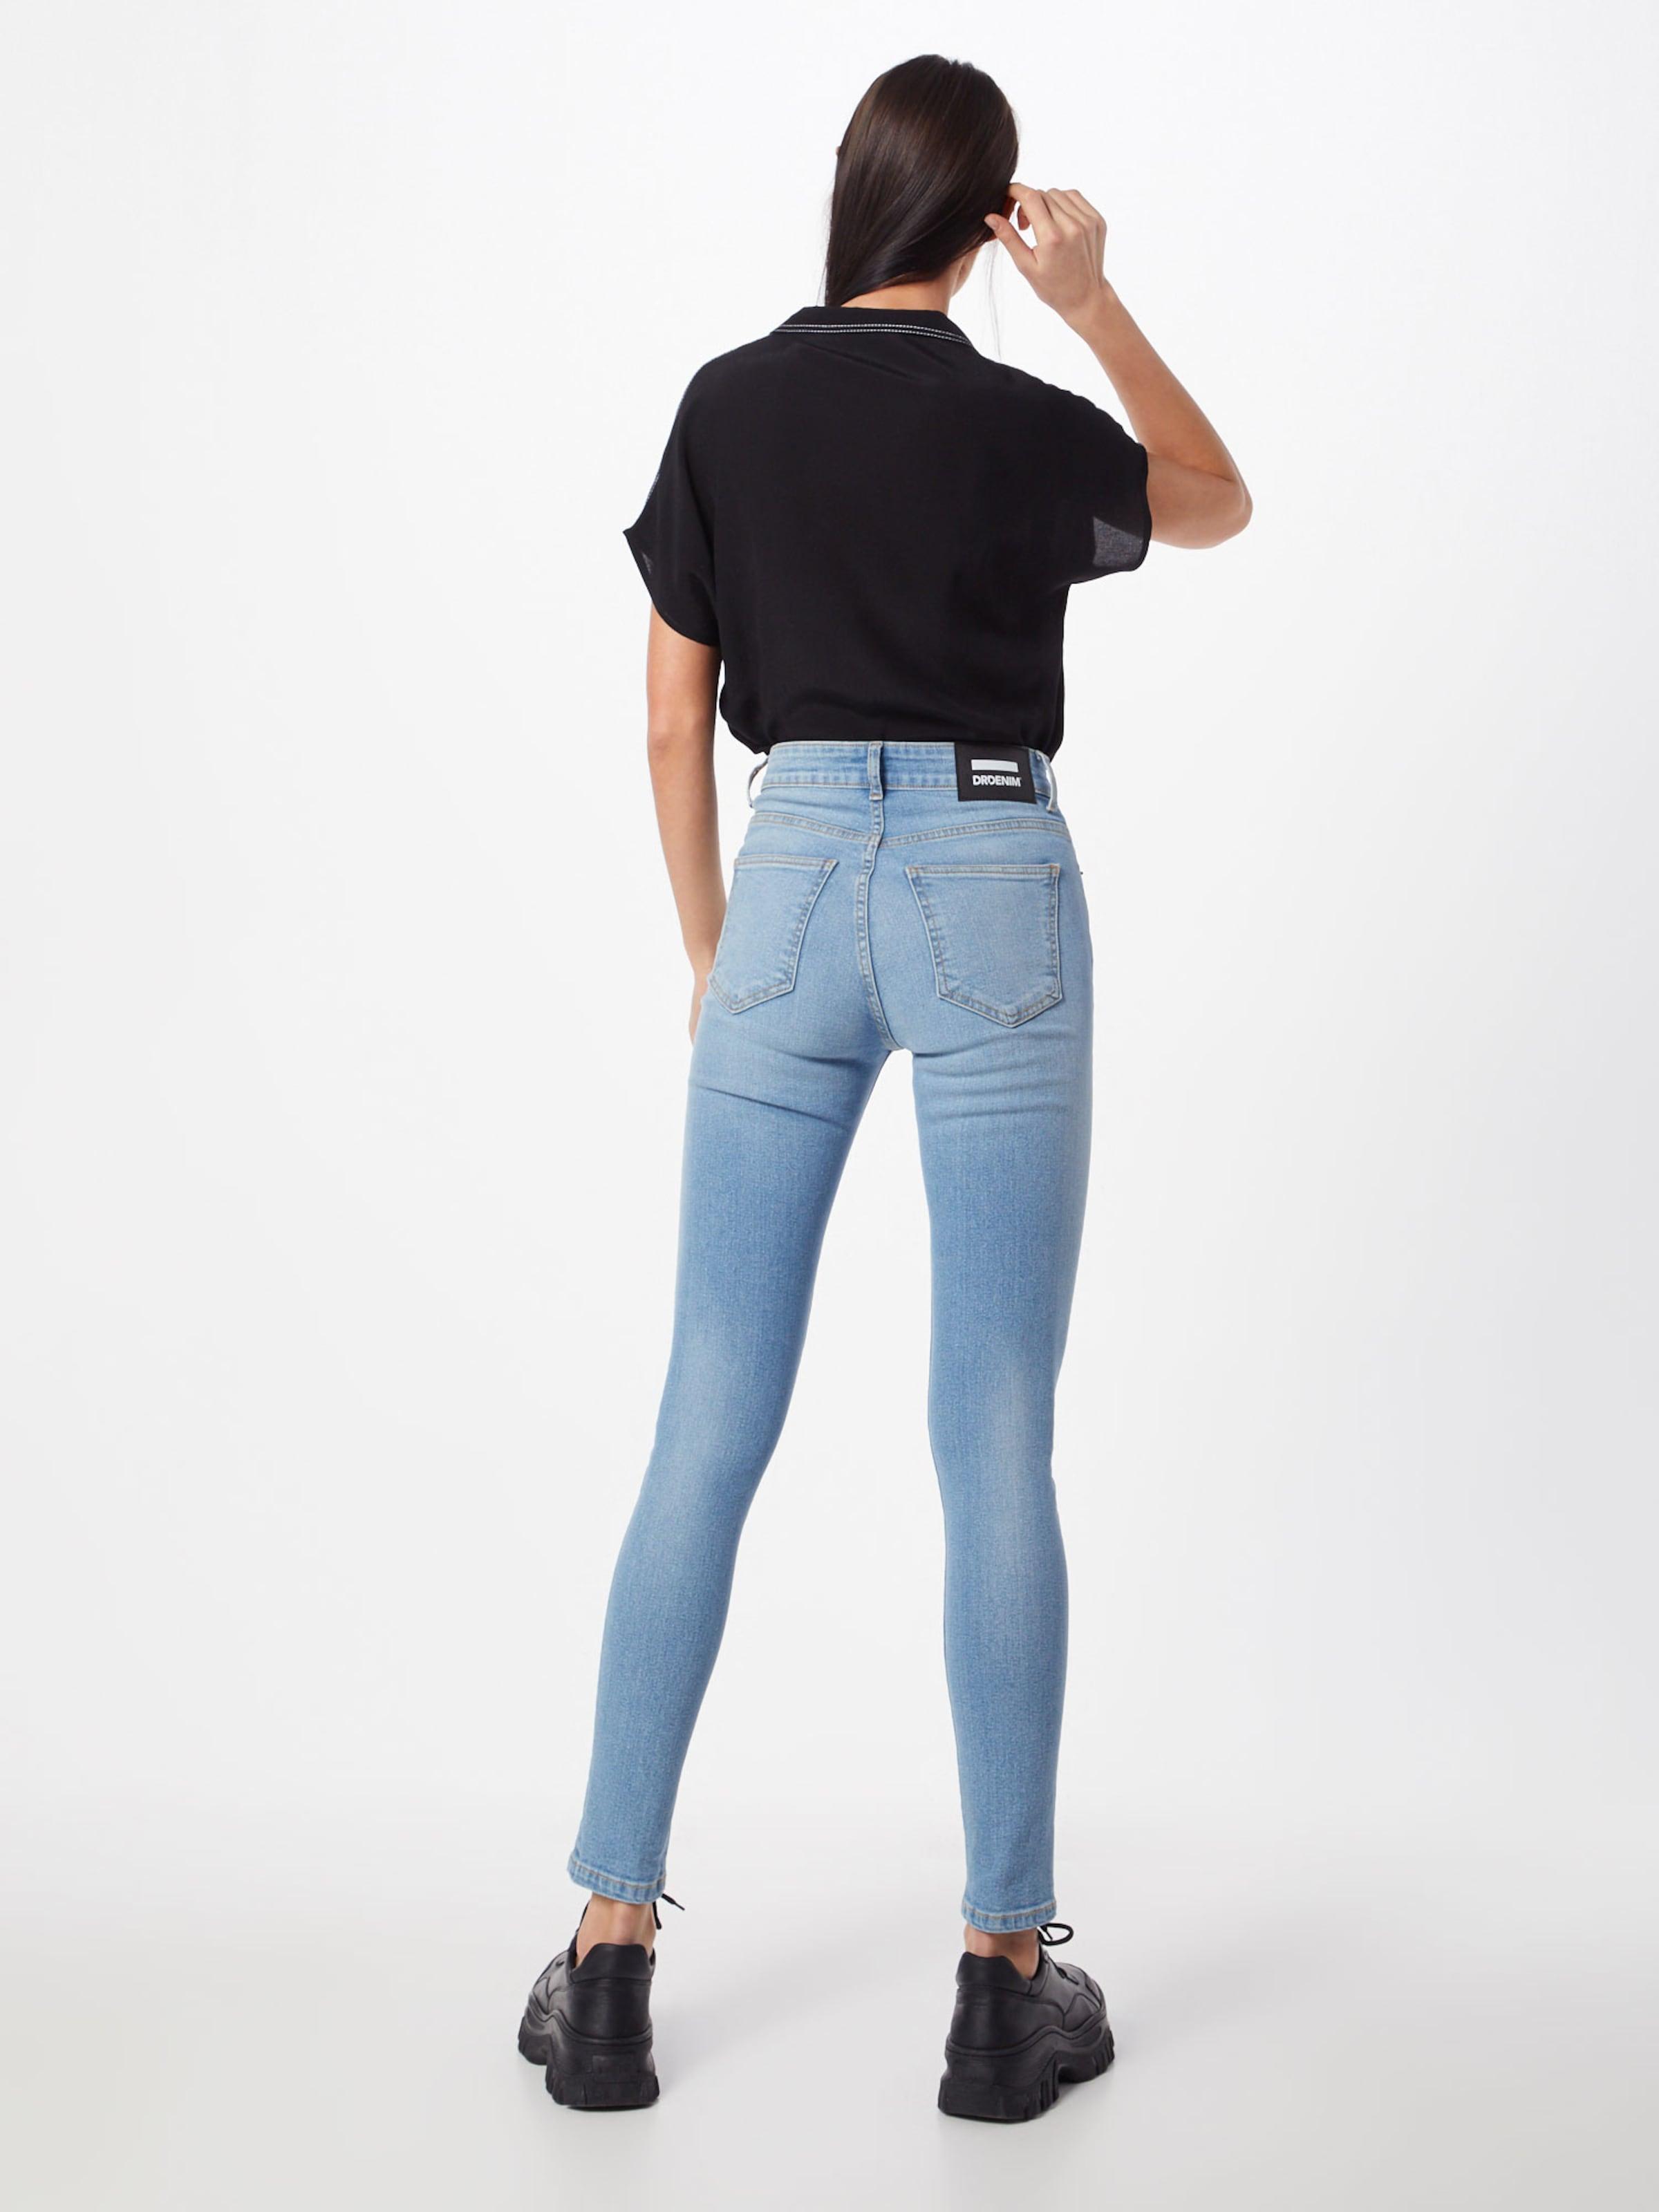 In Jeans Blue 'erin' Jeans DrDenim Blue In 'erin' Jeans In 'erin' DrDenim DrDenim T1cFJlK